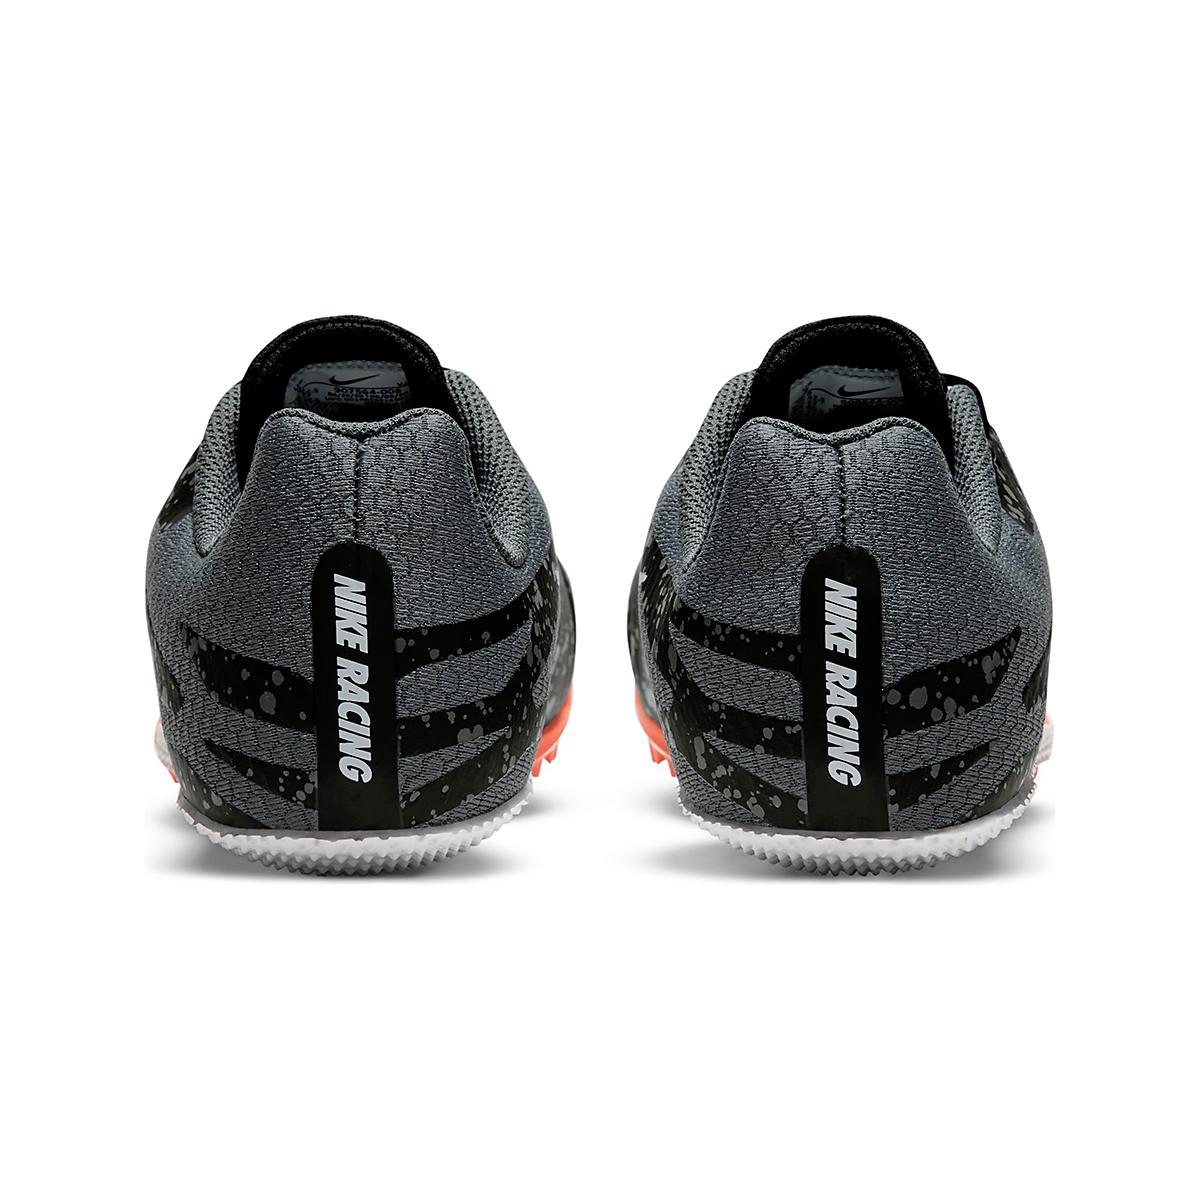 Men's Nike Zoom Rival S 9 Track Spikes - Color: Black/White/Orange - Size: 4 - Width: Regular, Black/White/Orange, large, image 5